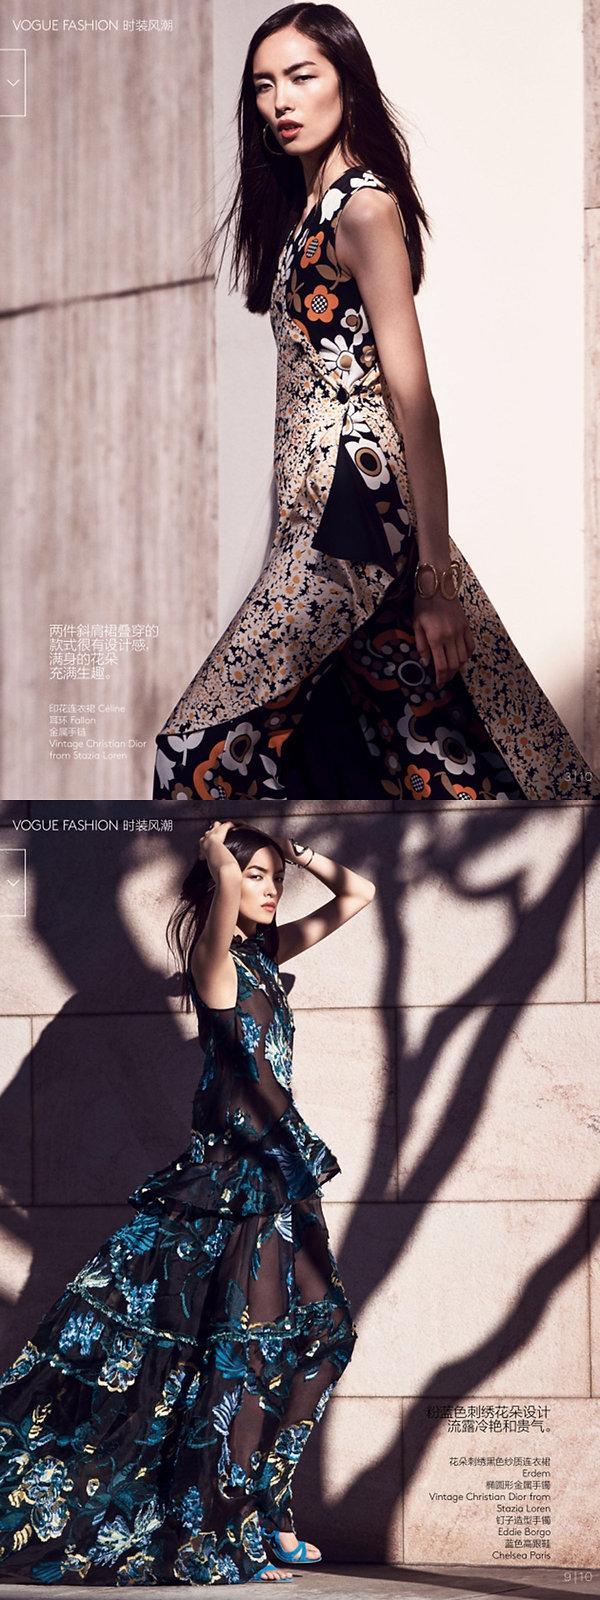 Vogue_China_March_2015.jpg